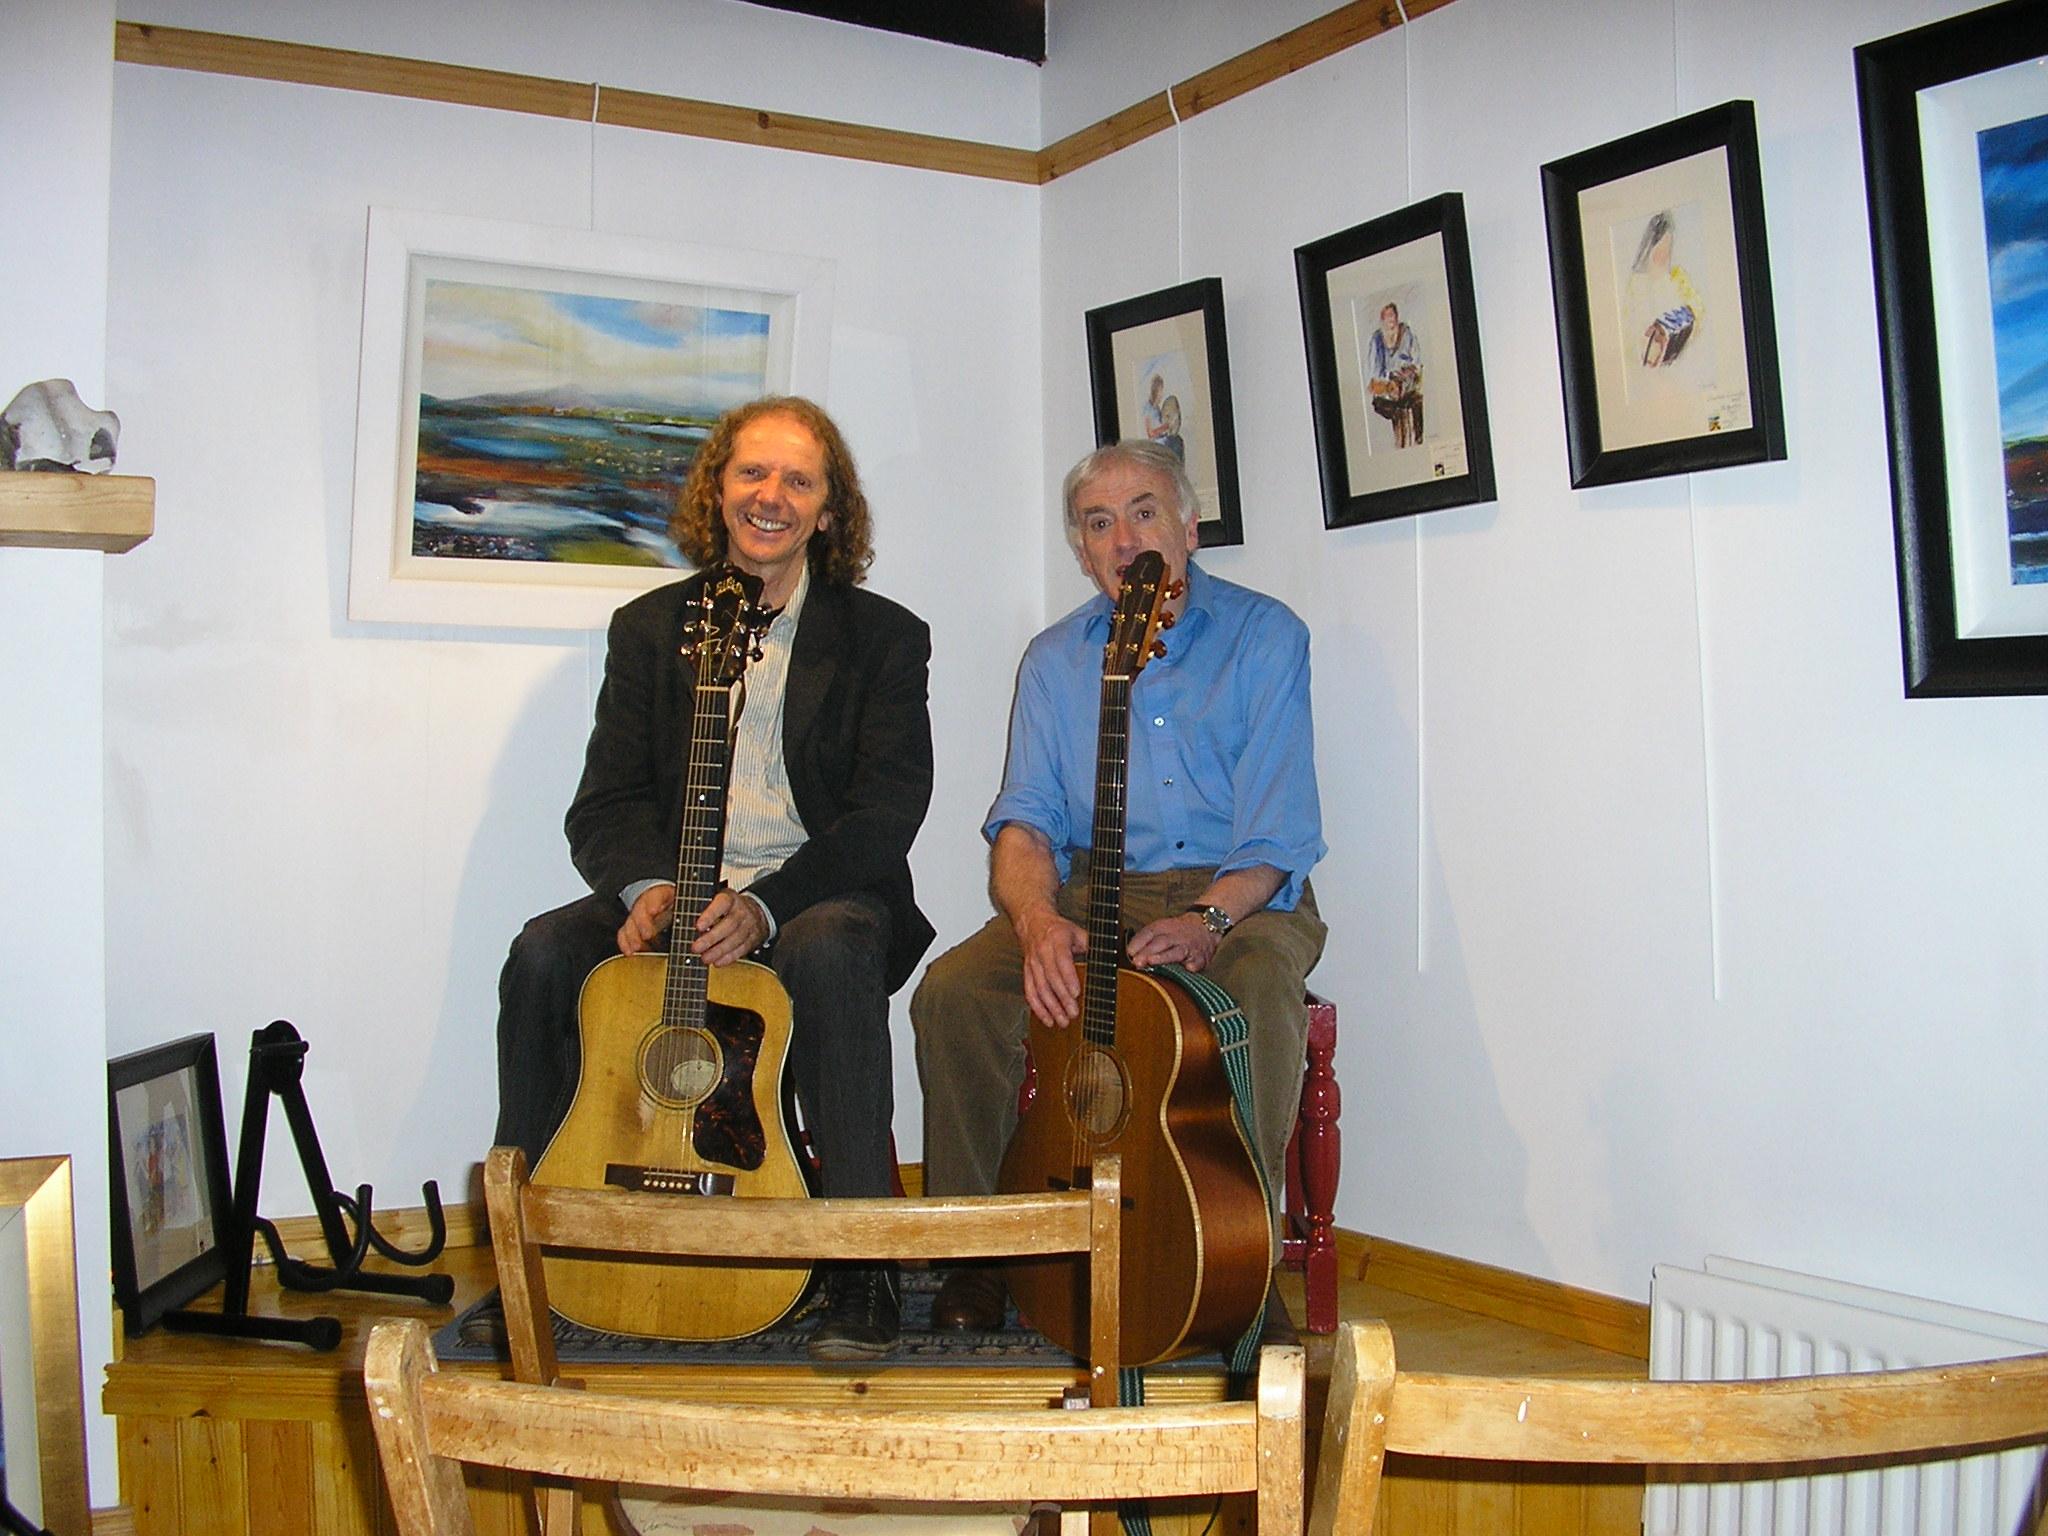 Seán Donnelly with Colum Sands